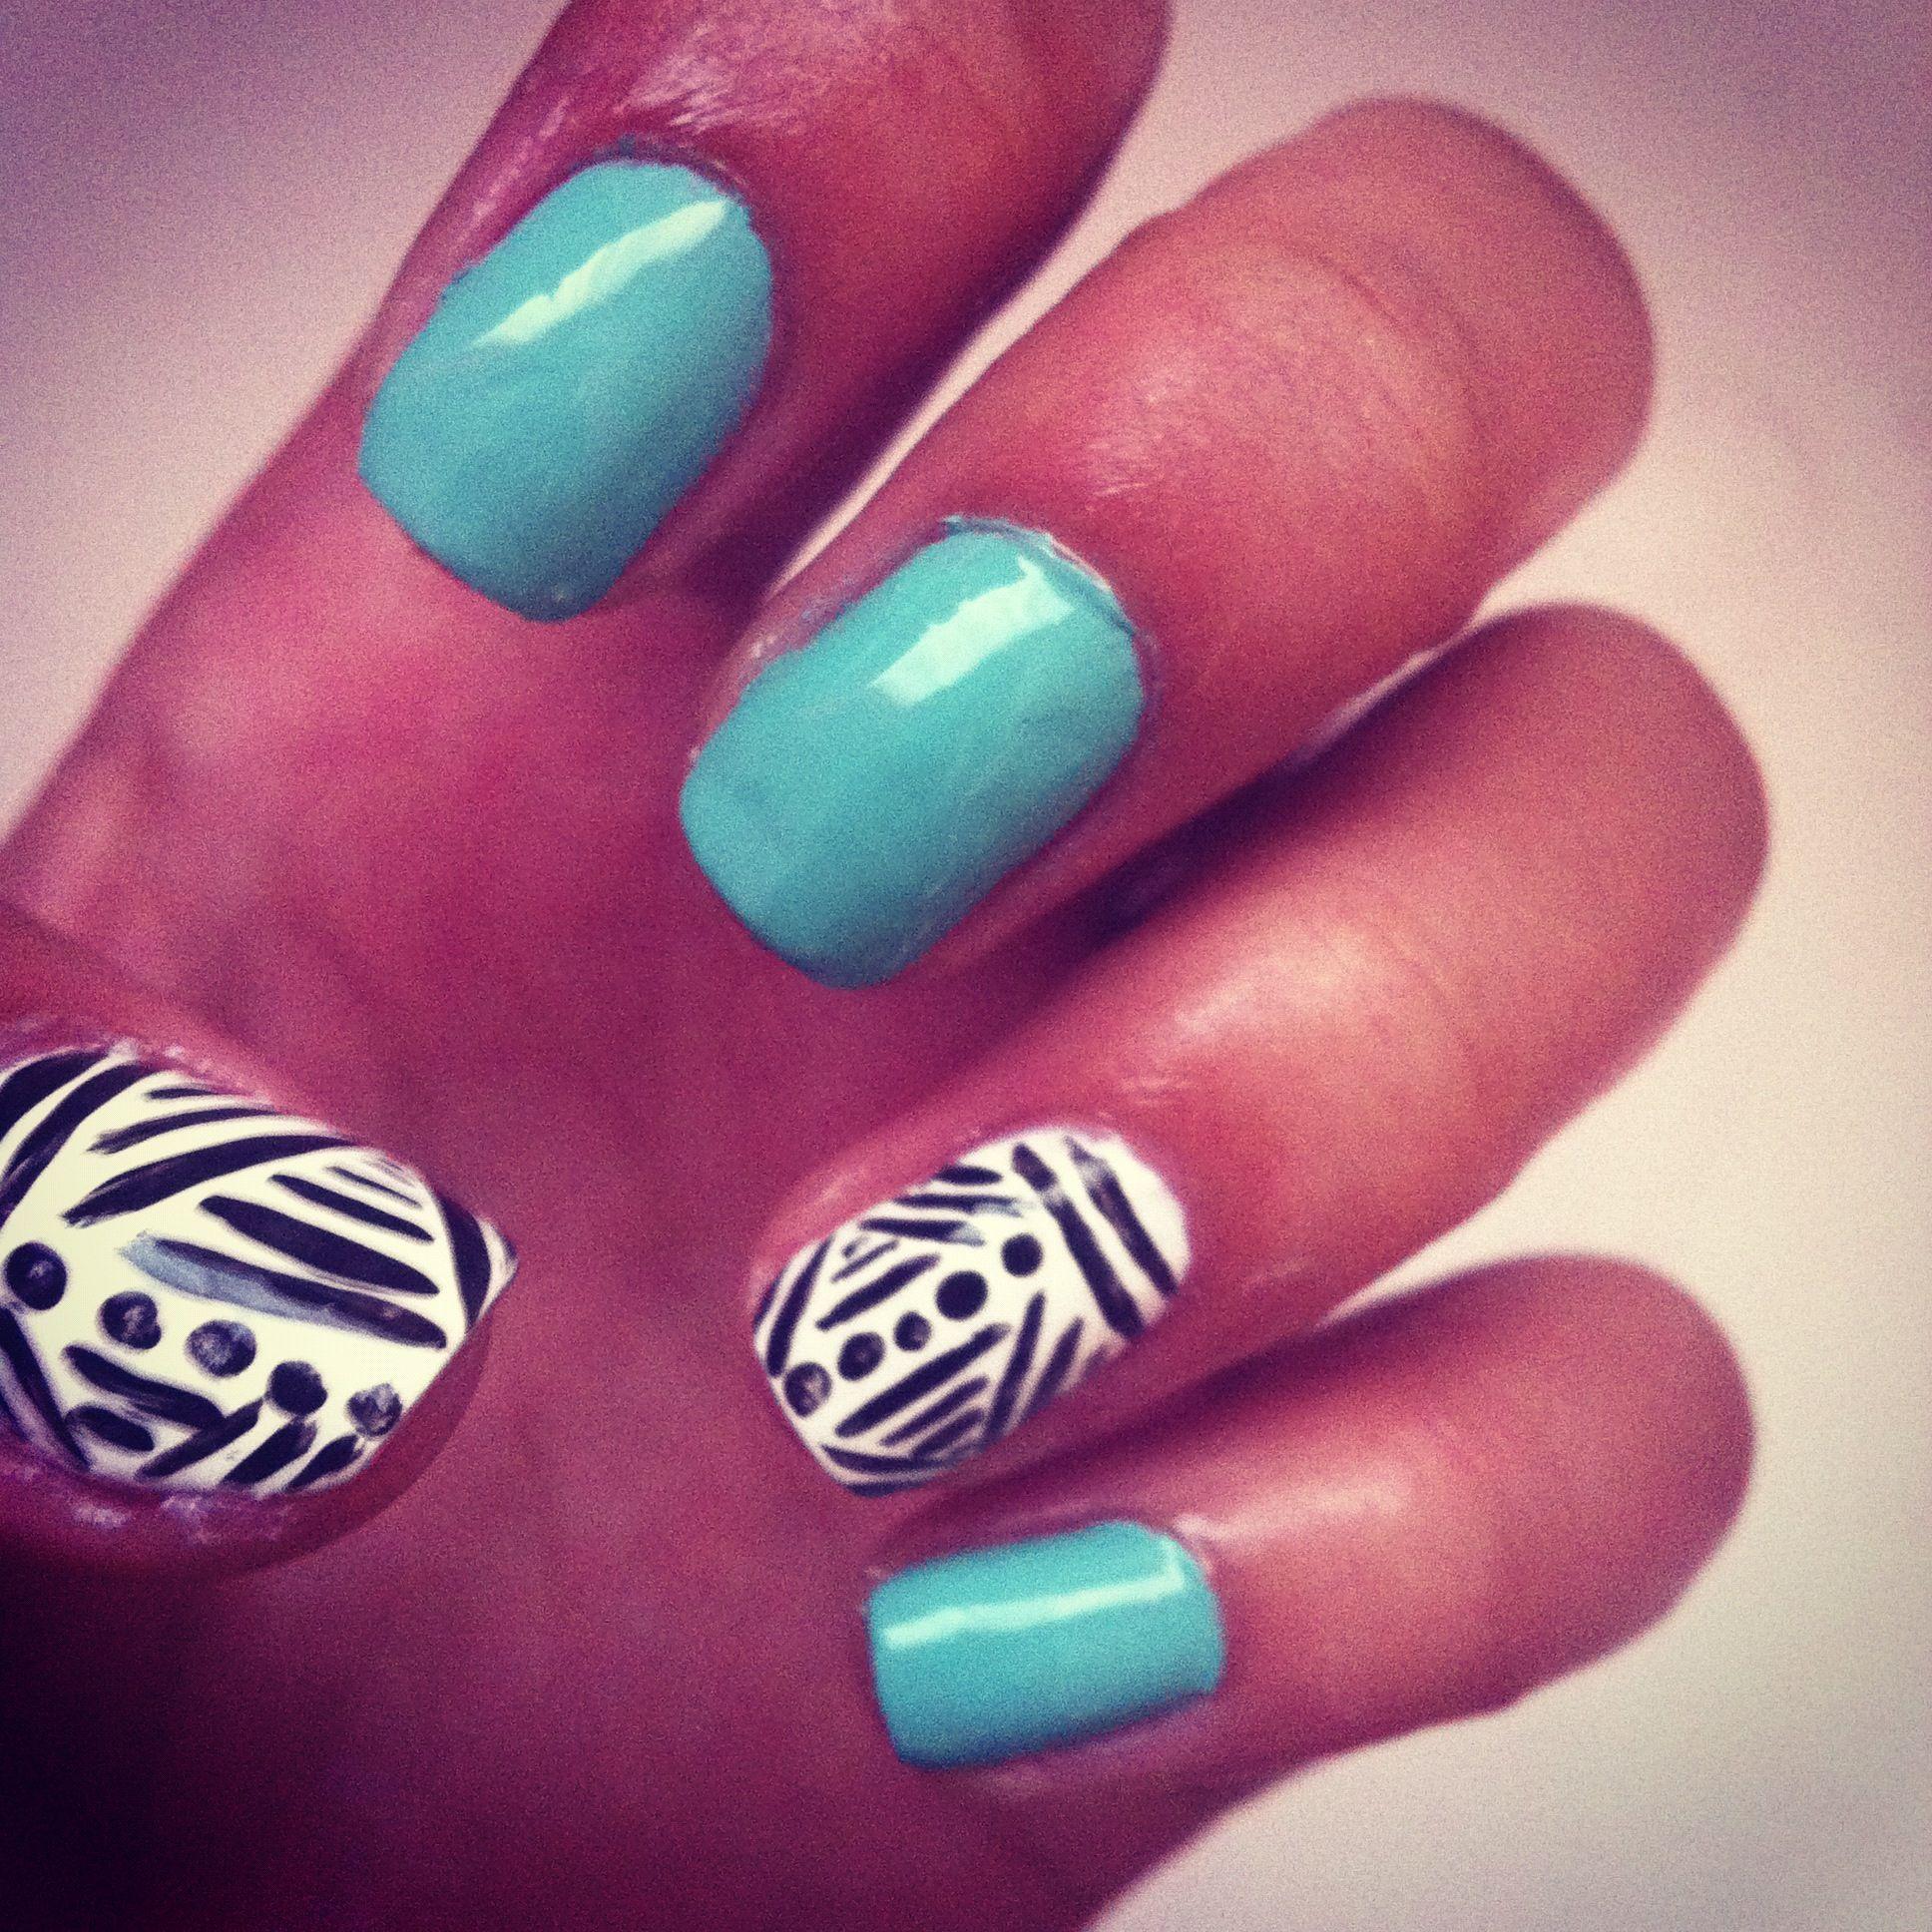 aztec nail design | nails | Pinterest | Aztec nail designs, Aztec ...